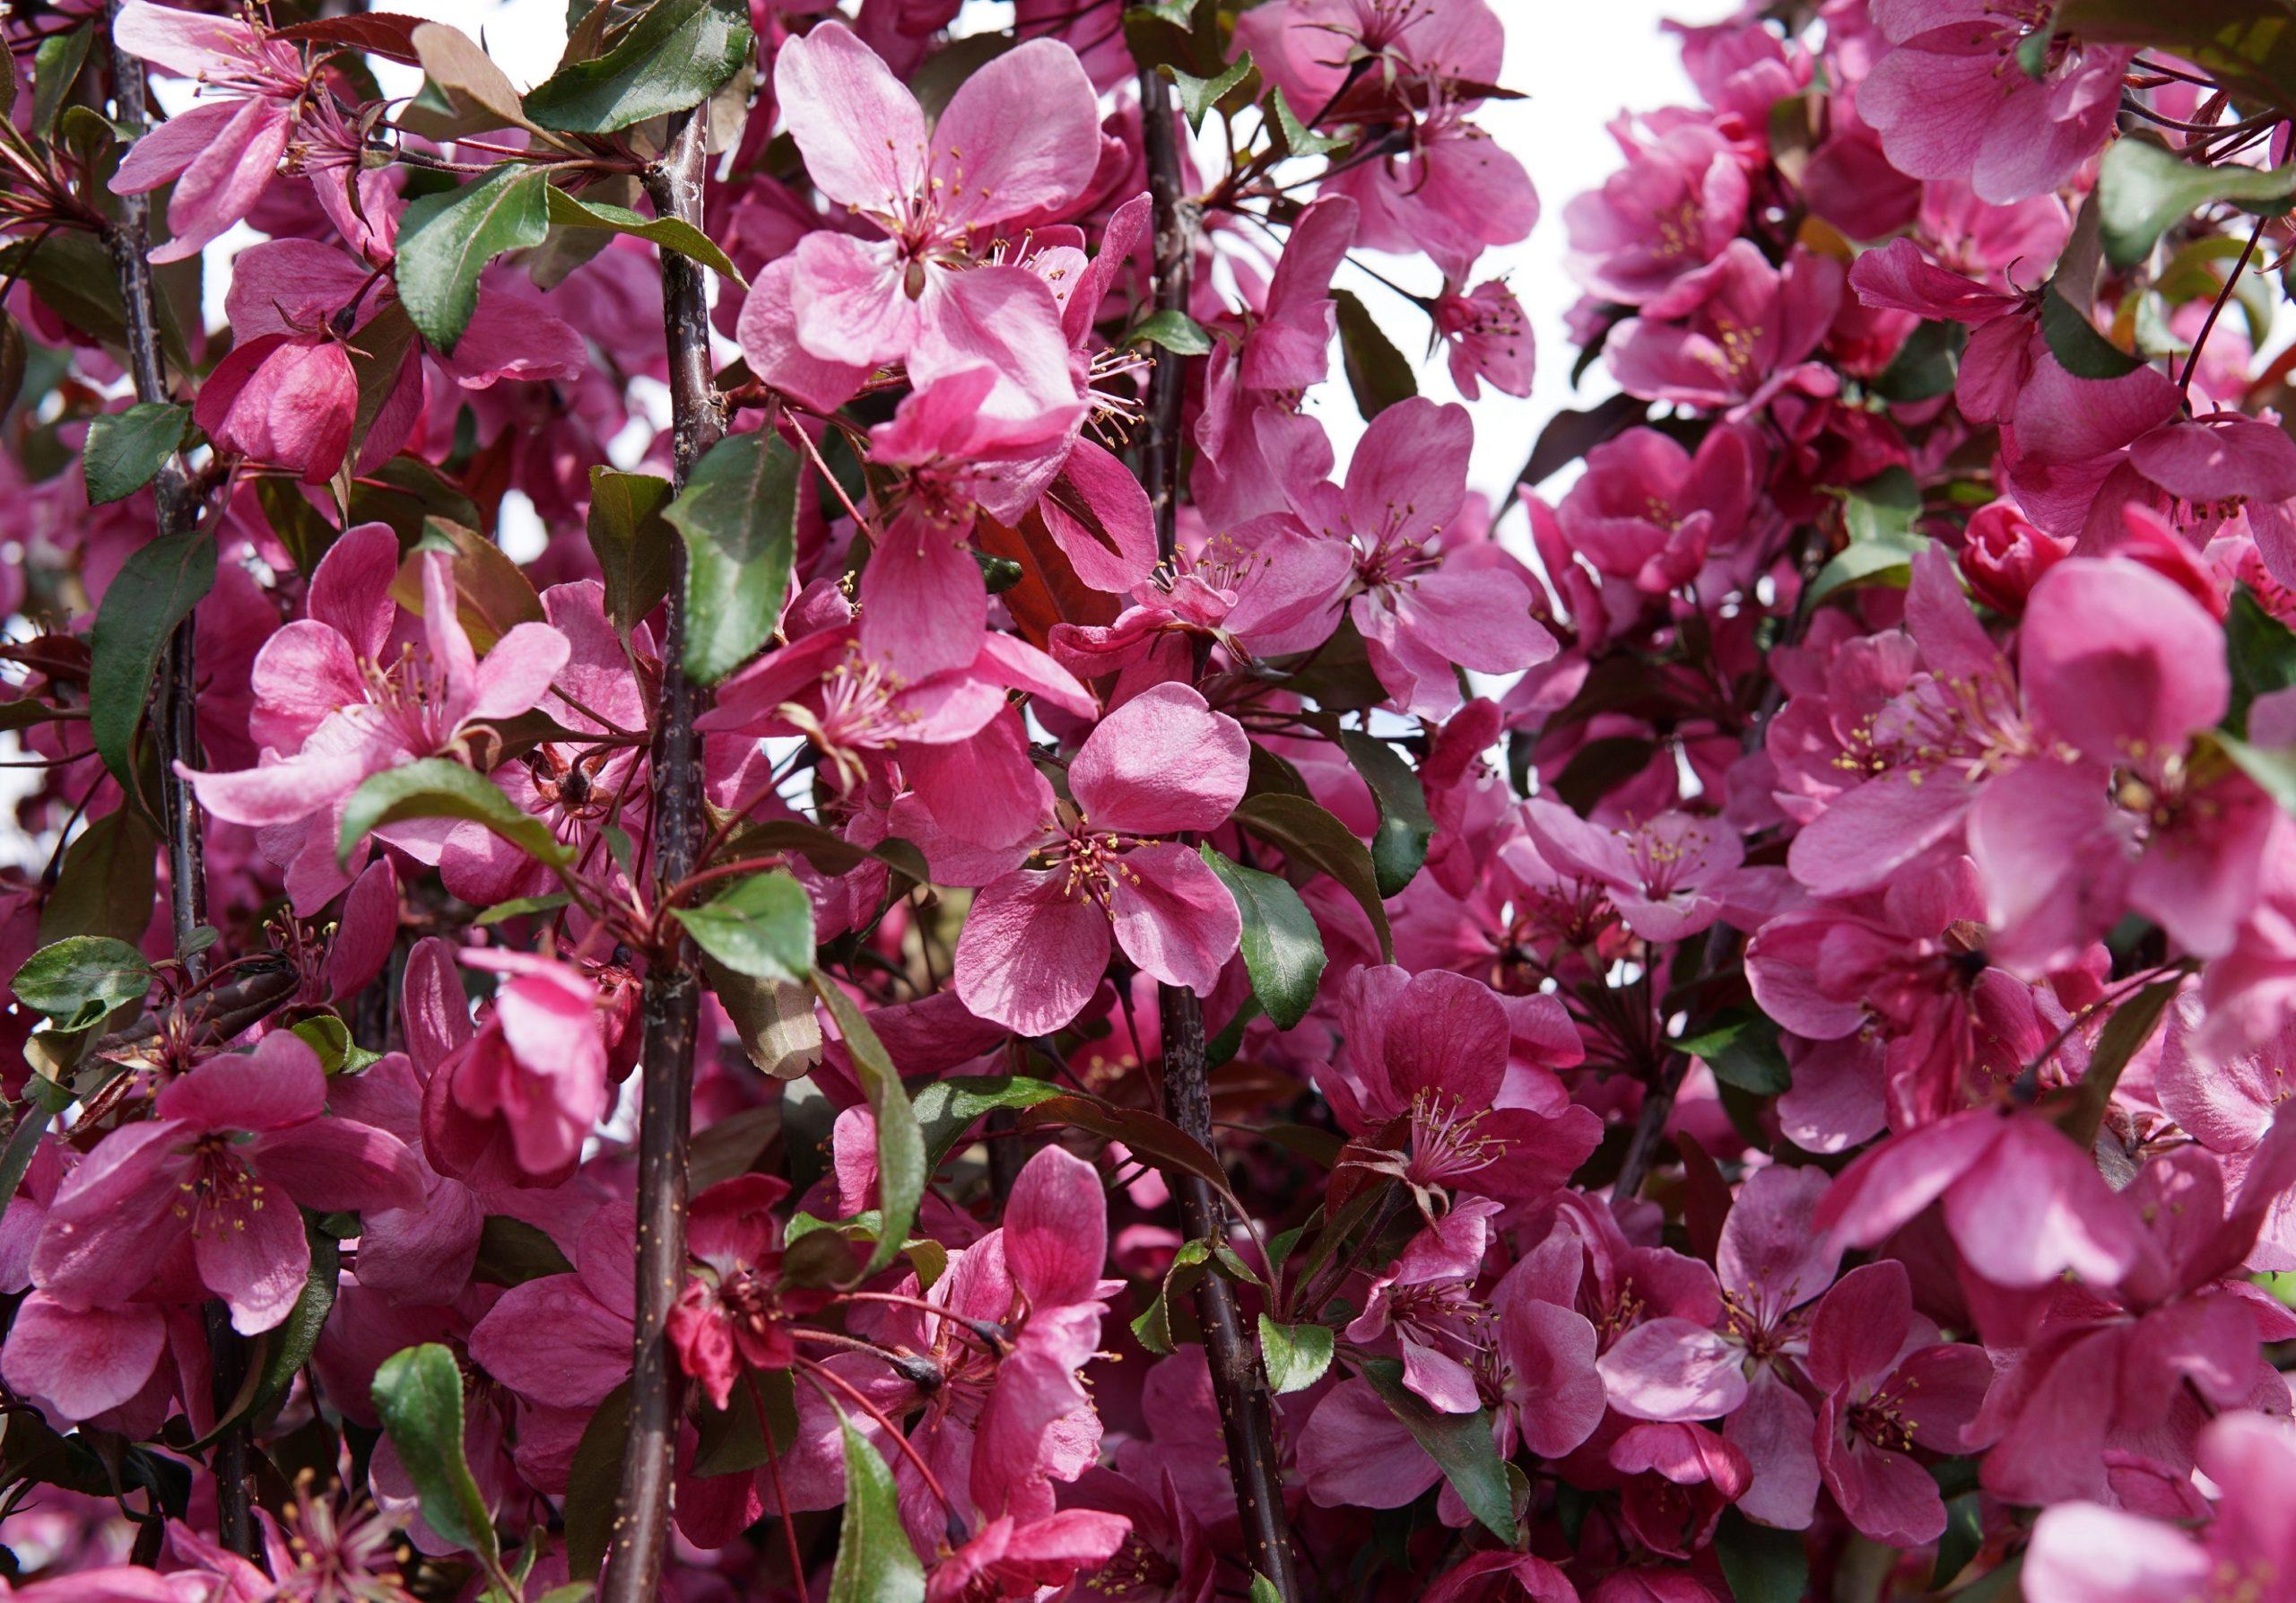 Gladiator Rosybloom Crabapple bloom